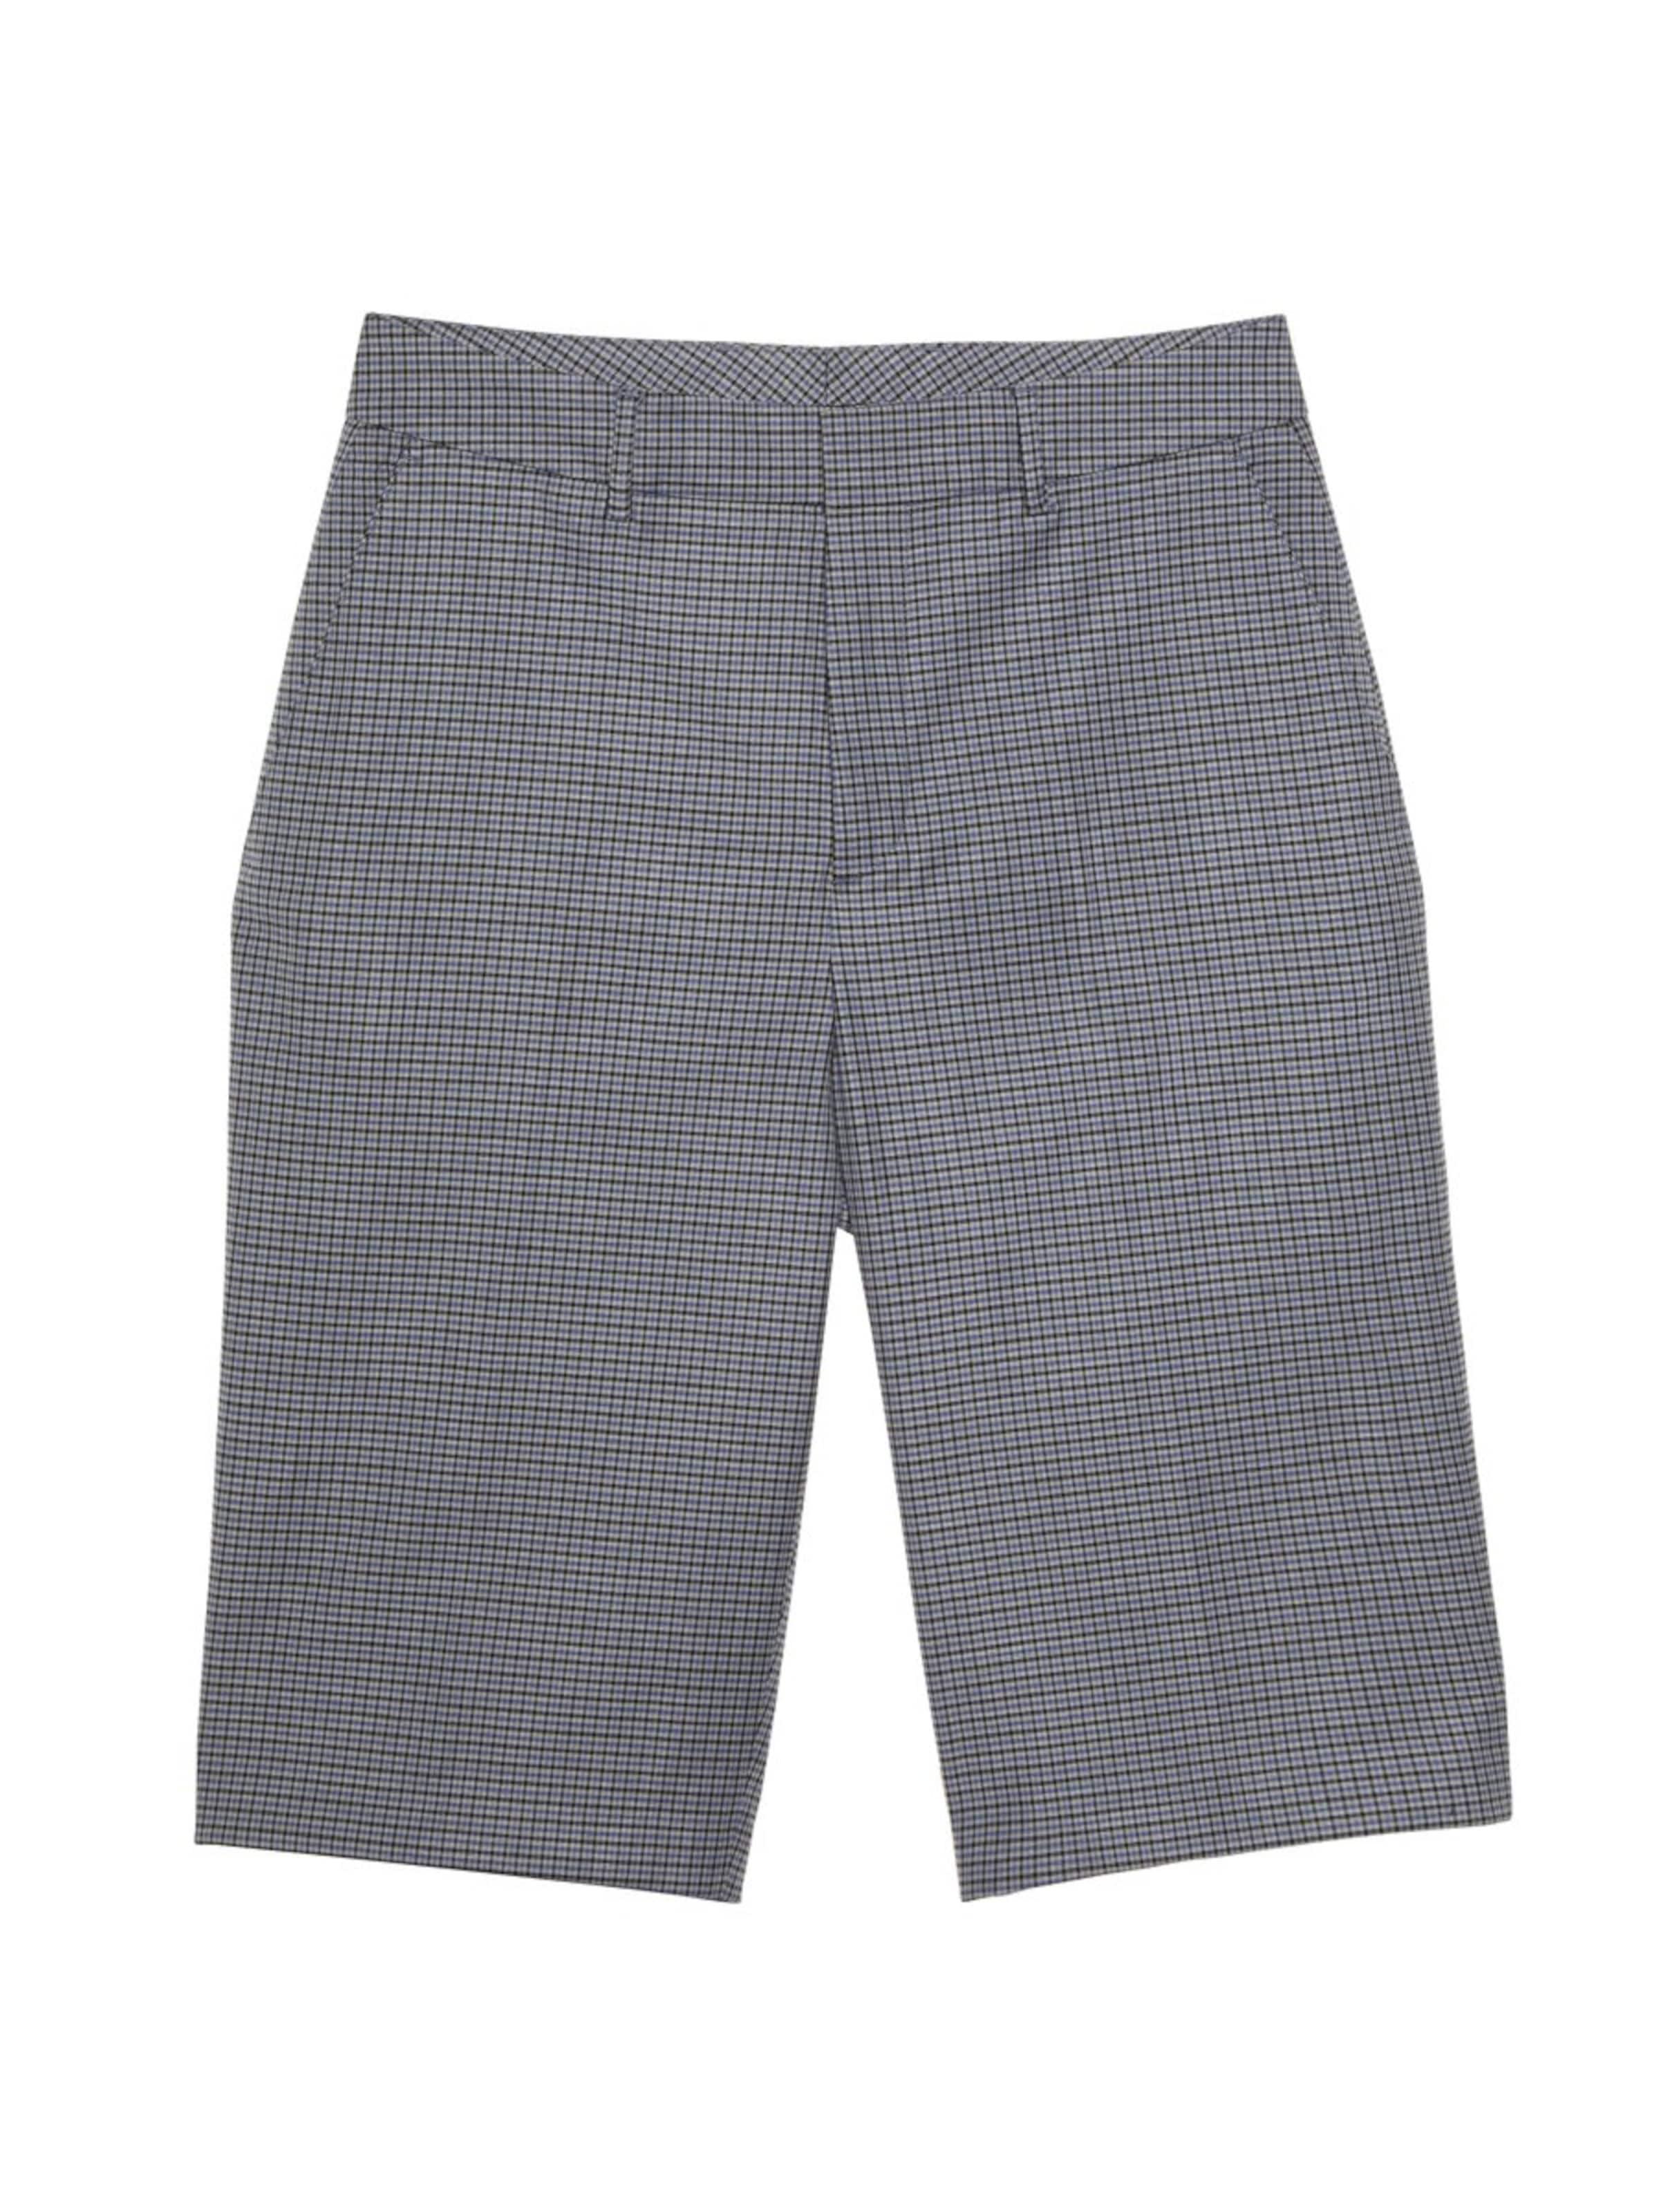 En J lindeberg Pantalon Check' À Bleu Plis 'sarah Marine Micro doCxBe